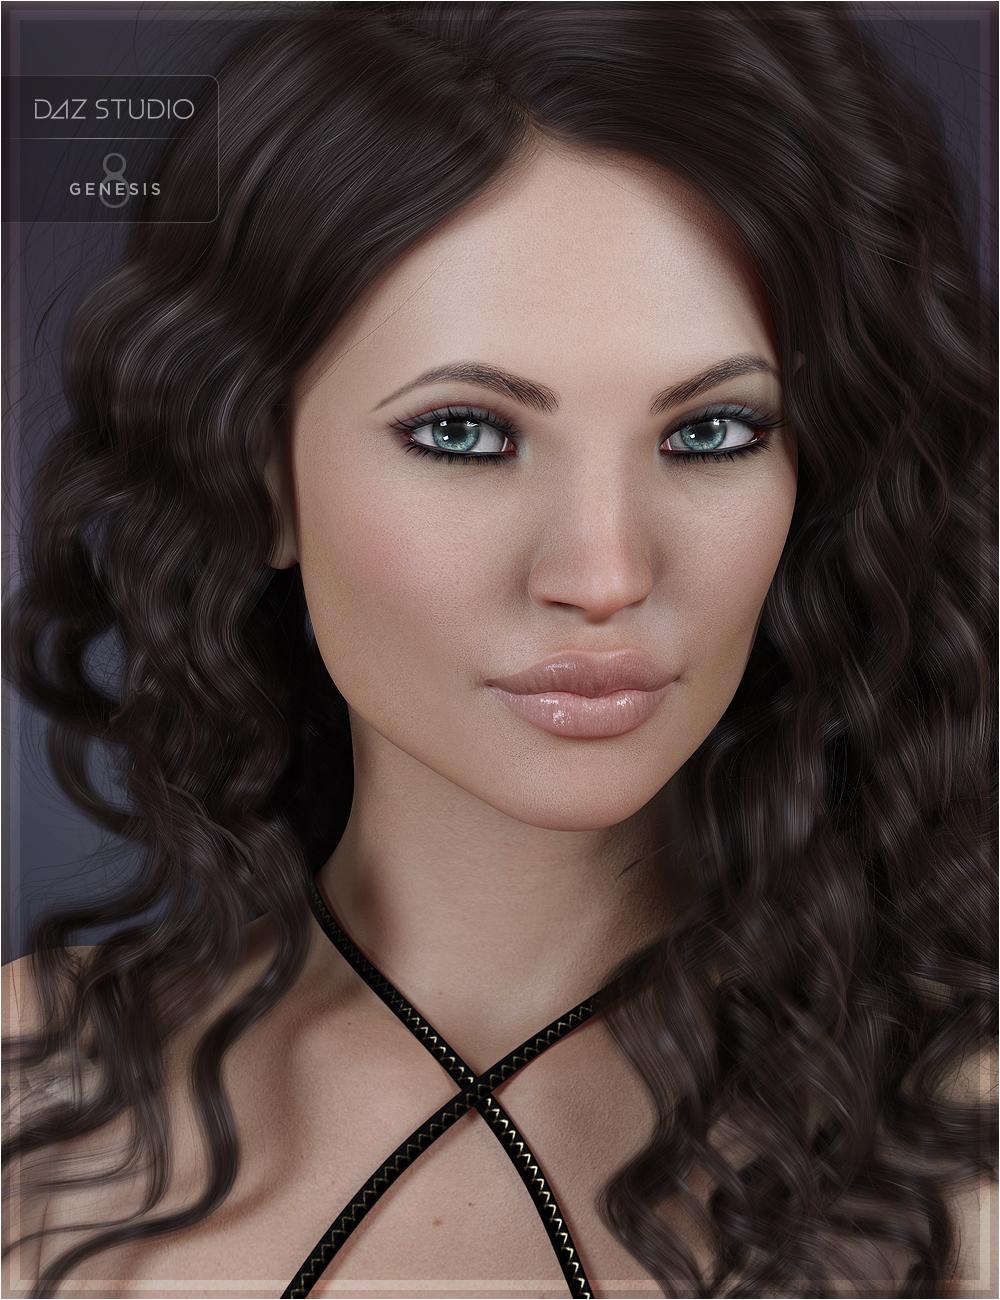 Bahari for Genesis 8 Female by: OziChickTwiztedMetal, 3D Models by Daz 3D